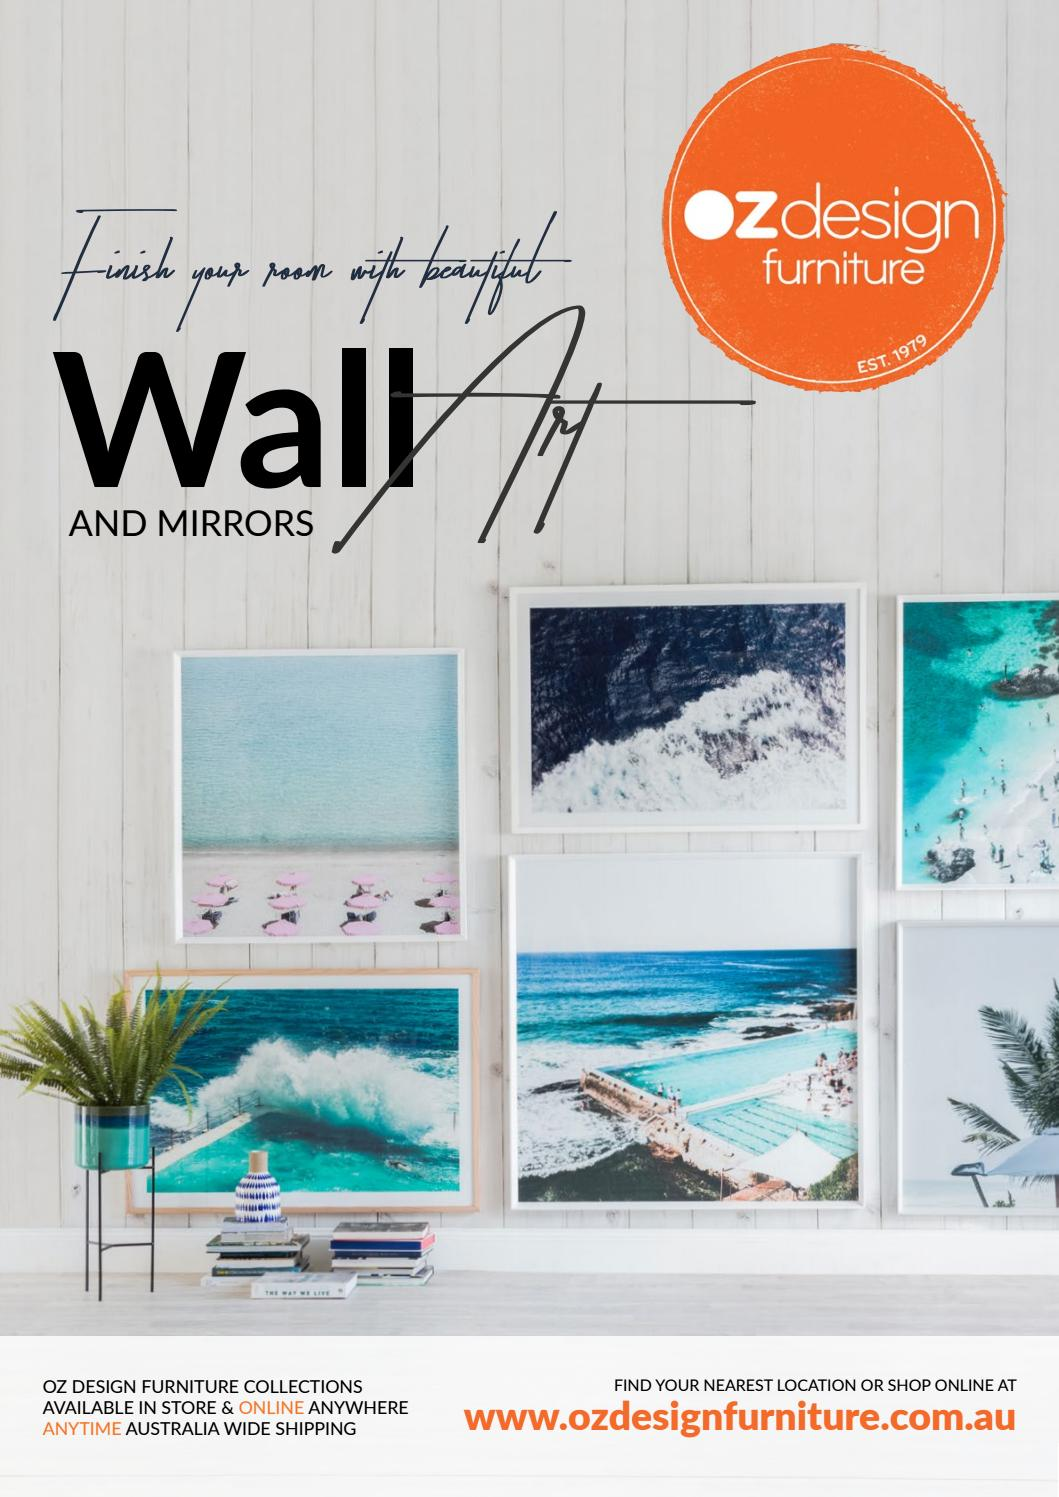 Wall Art and Mirrors E catalogue   OZ Design Furniture by Oz Design  Furniture   issuu. Wall Art and Mirrors E catalogue   OZ Design Furniture by Oz